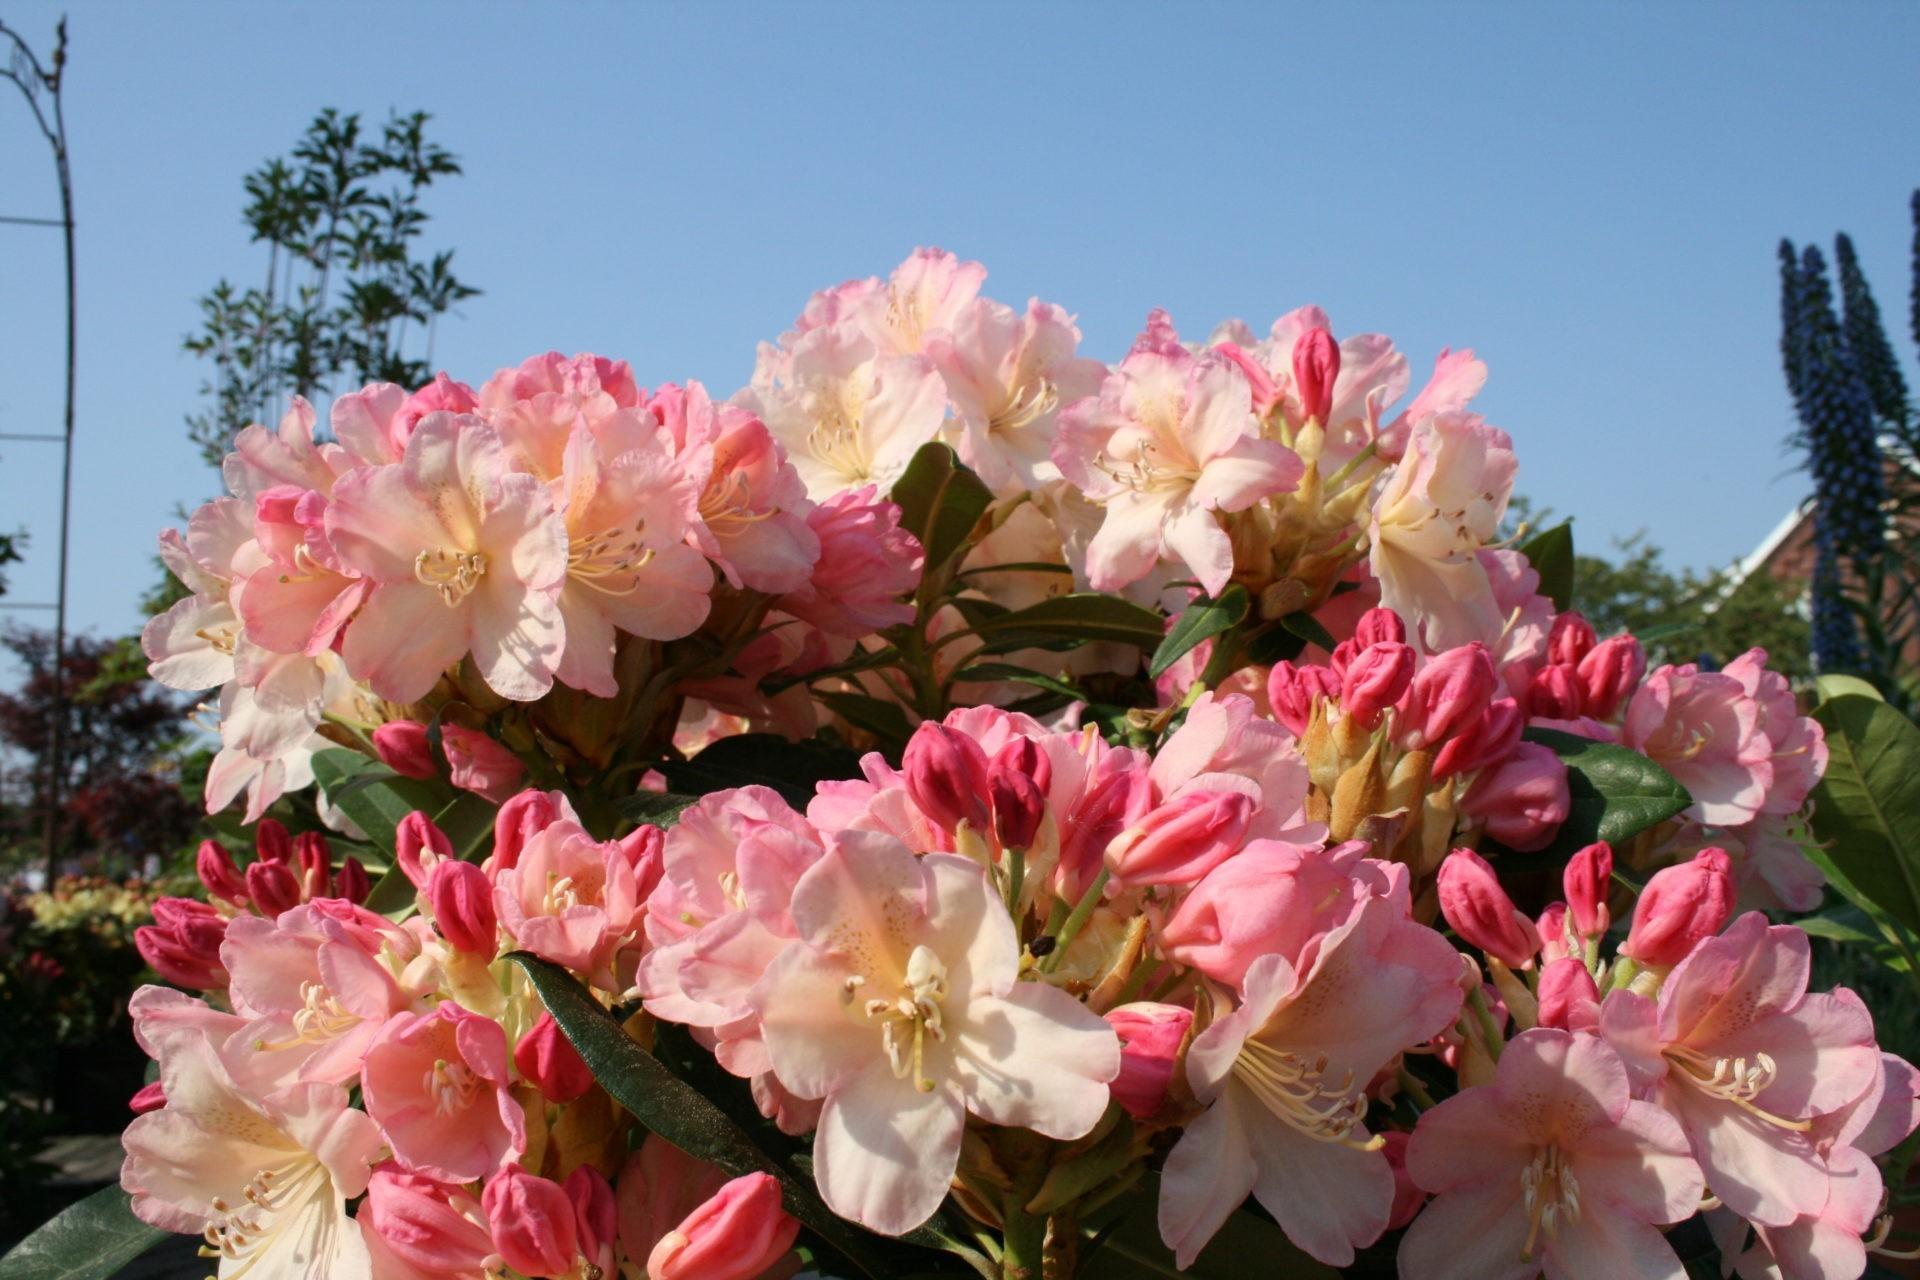 Rhododendron Blüte im Mai